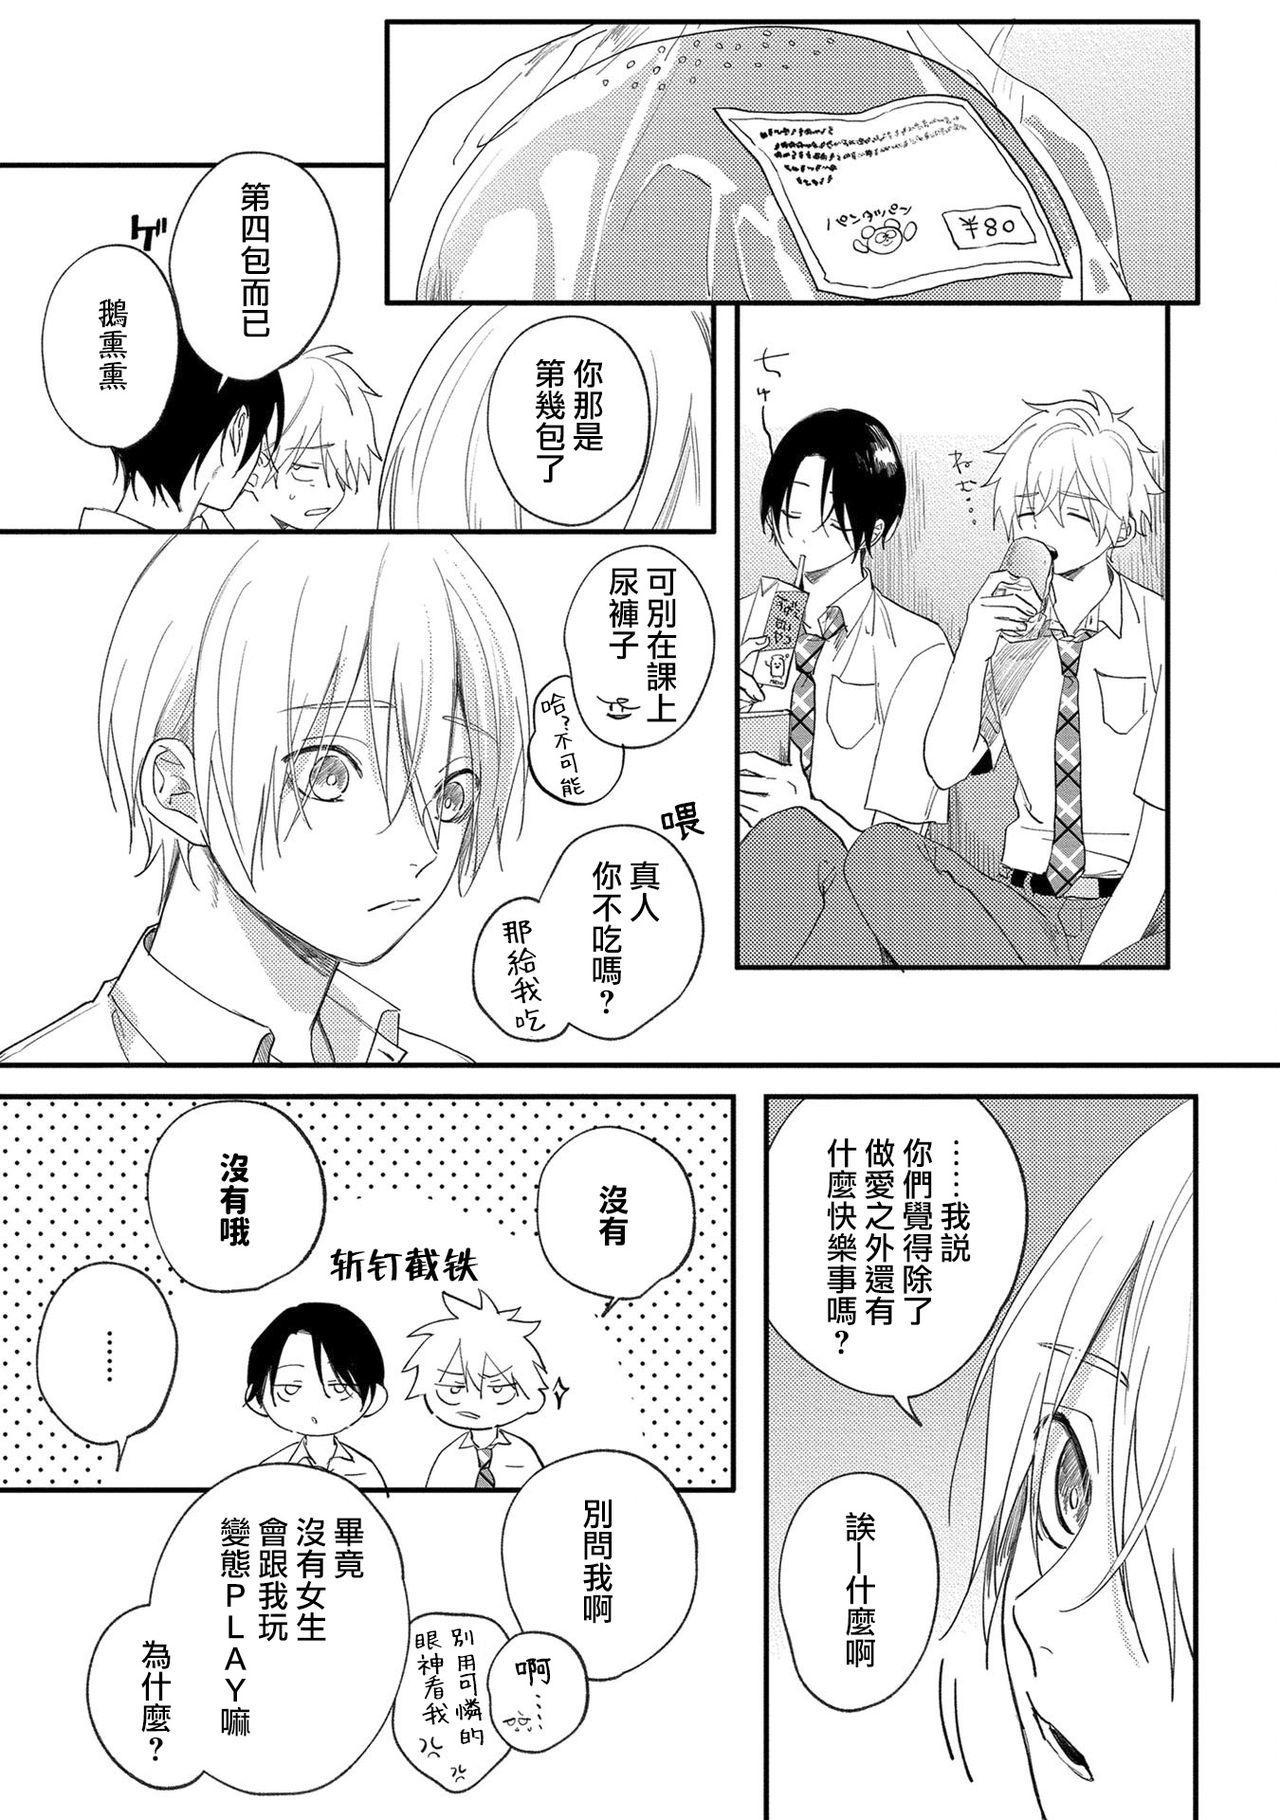 [Utata Hakuto] Houkago Virginity - Virginity afterschool 1-5 完结 [Chinese] [拾荒者汉化组] [Digital] 65